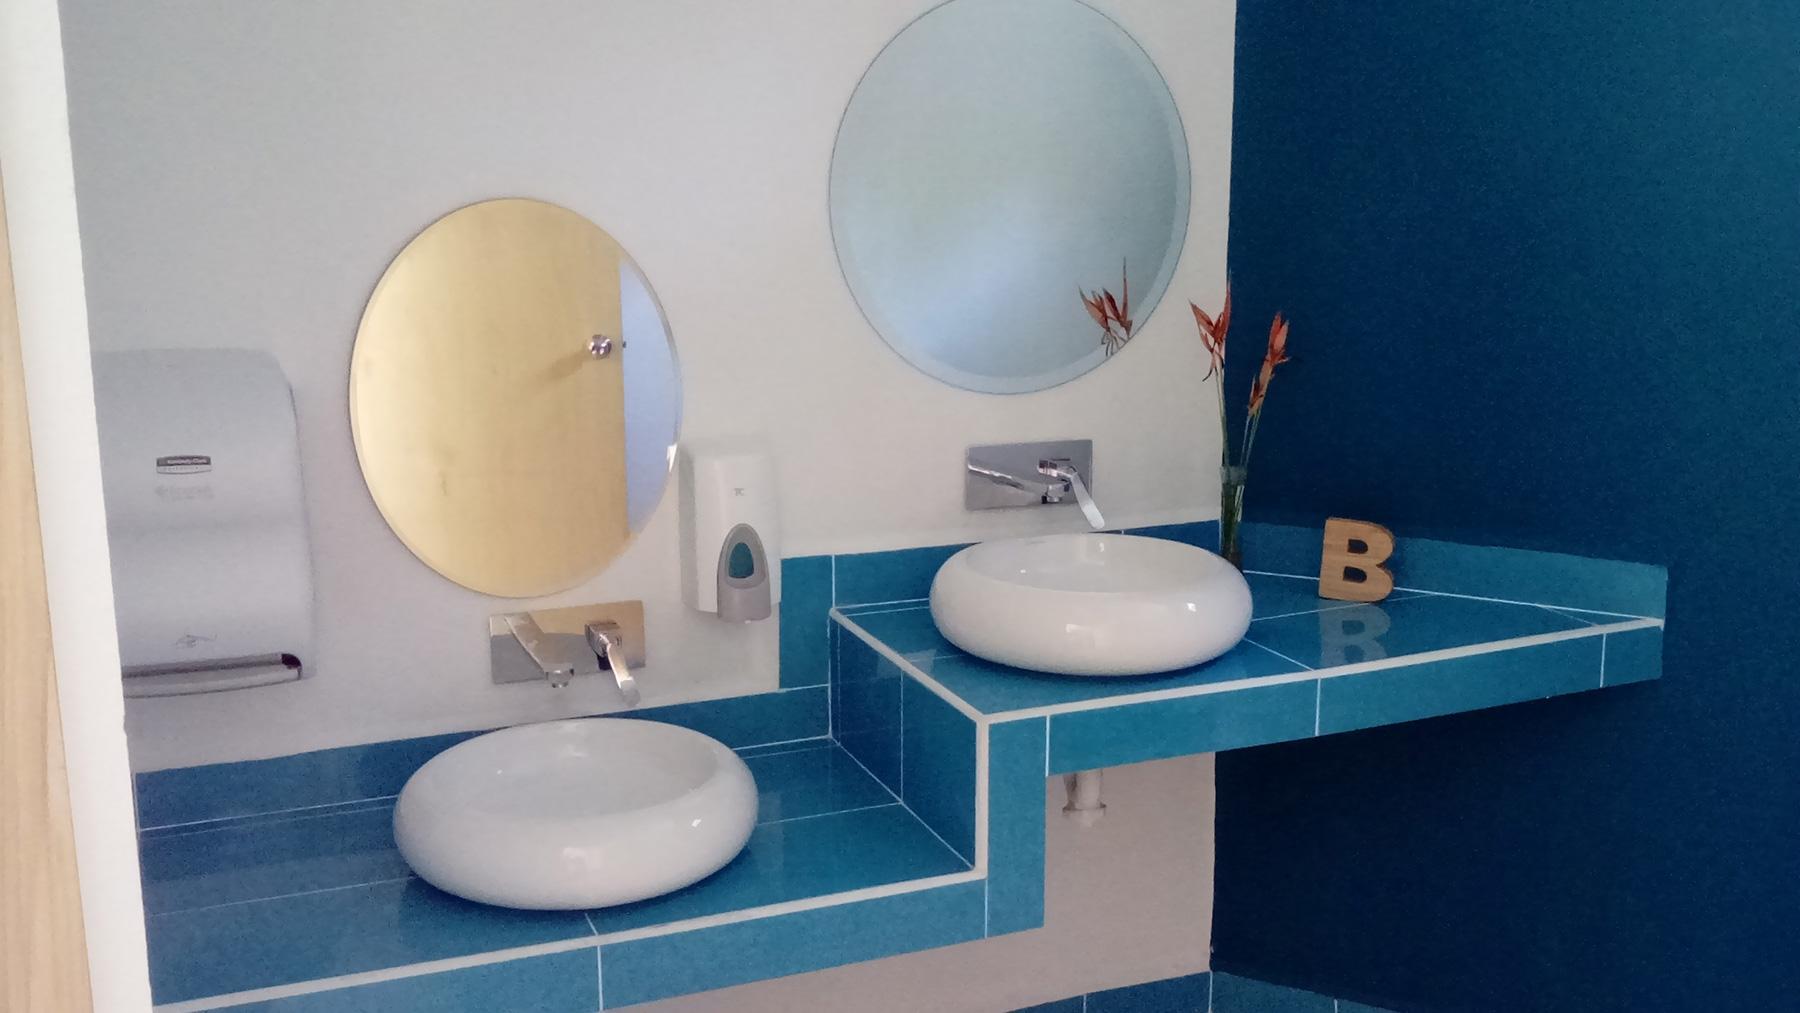 Proyectos SPAD Constructora, Westin Family Kids Club, Baño azul lavamanos, Diseño de Interiores, Arquitectura, Puerto Vallarta, Jalisco, México